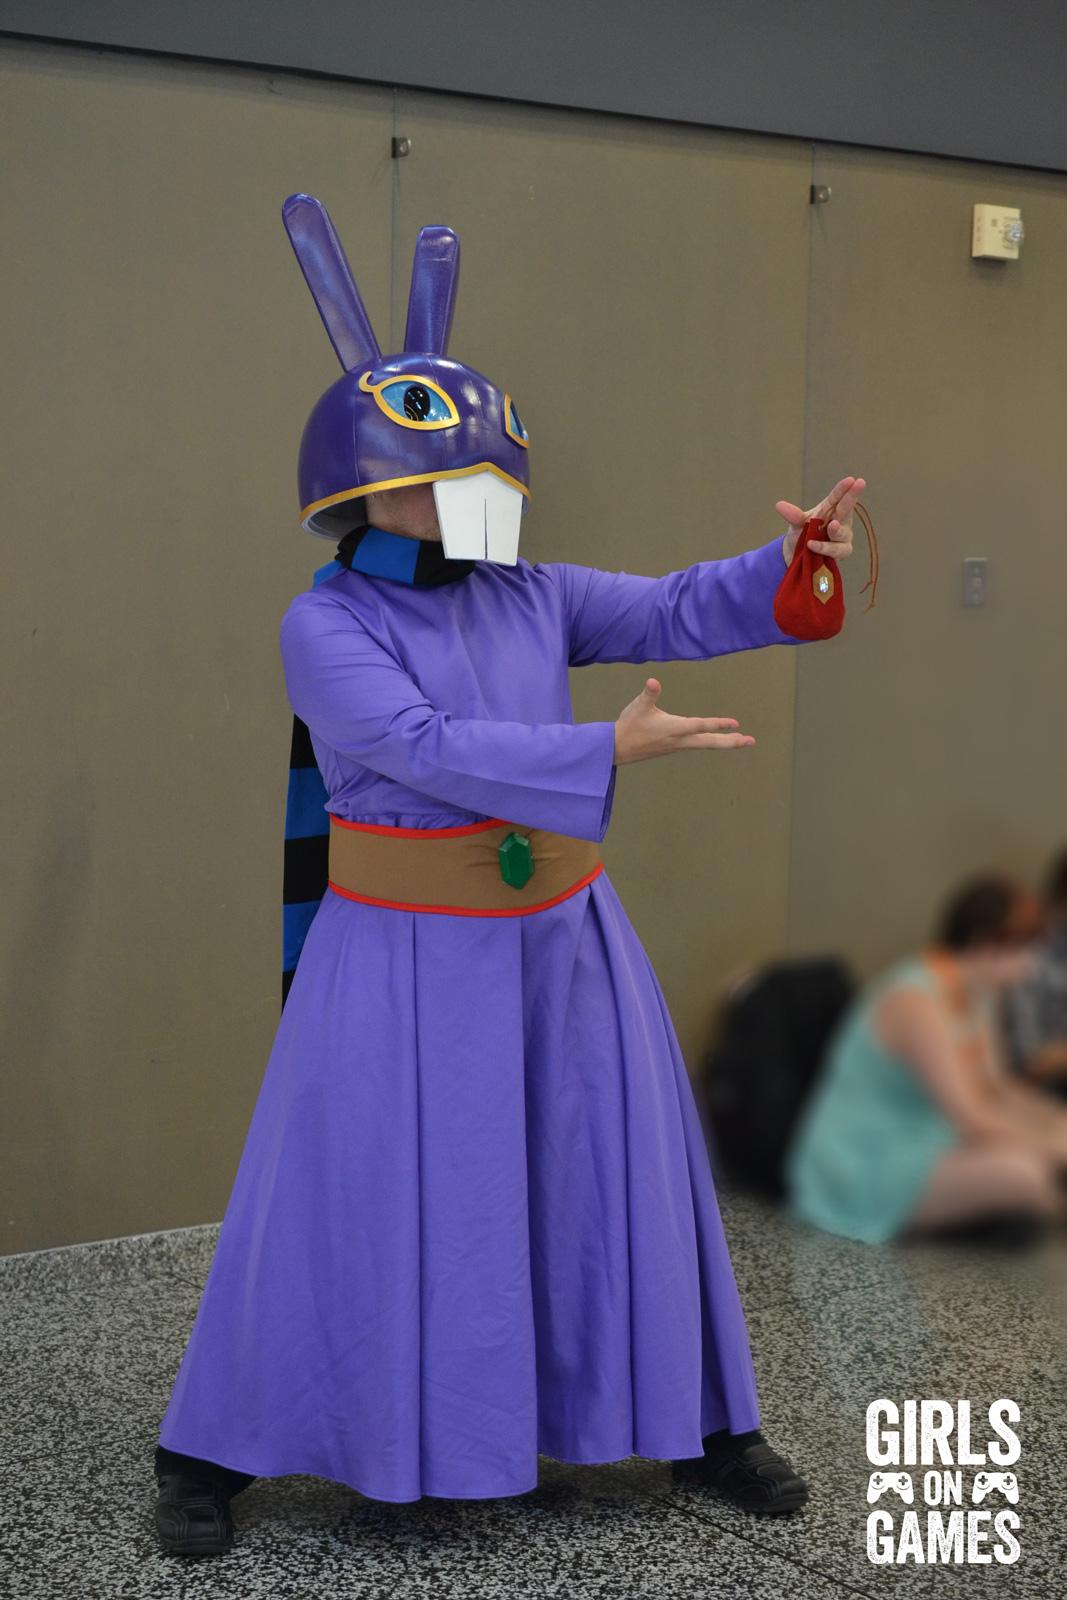 Ravio (The Legend of Zelda) cosplay at Otakuthon 2015.